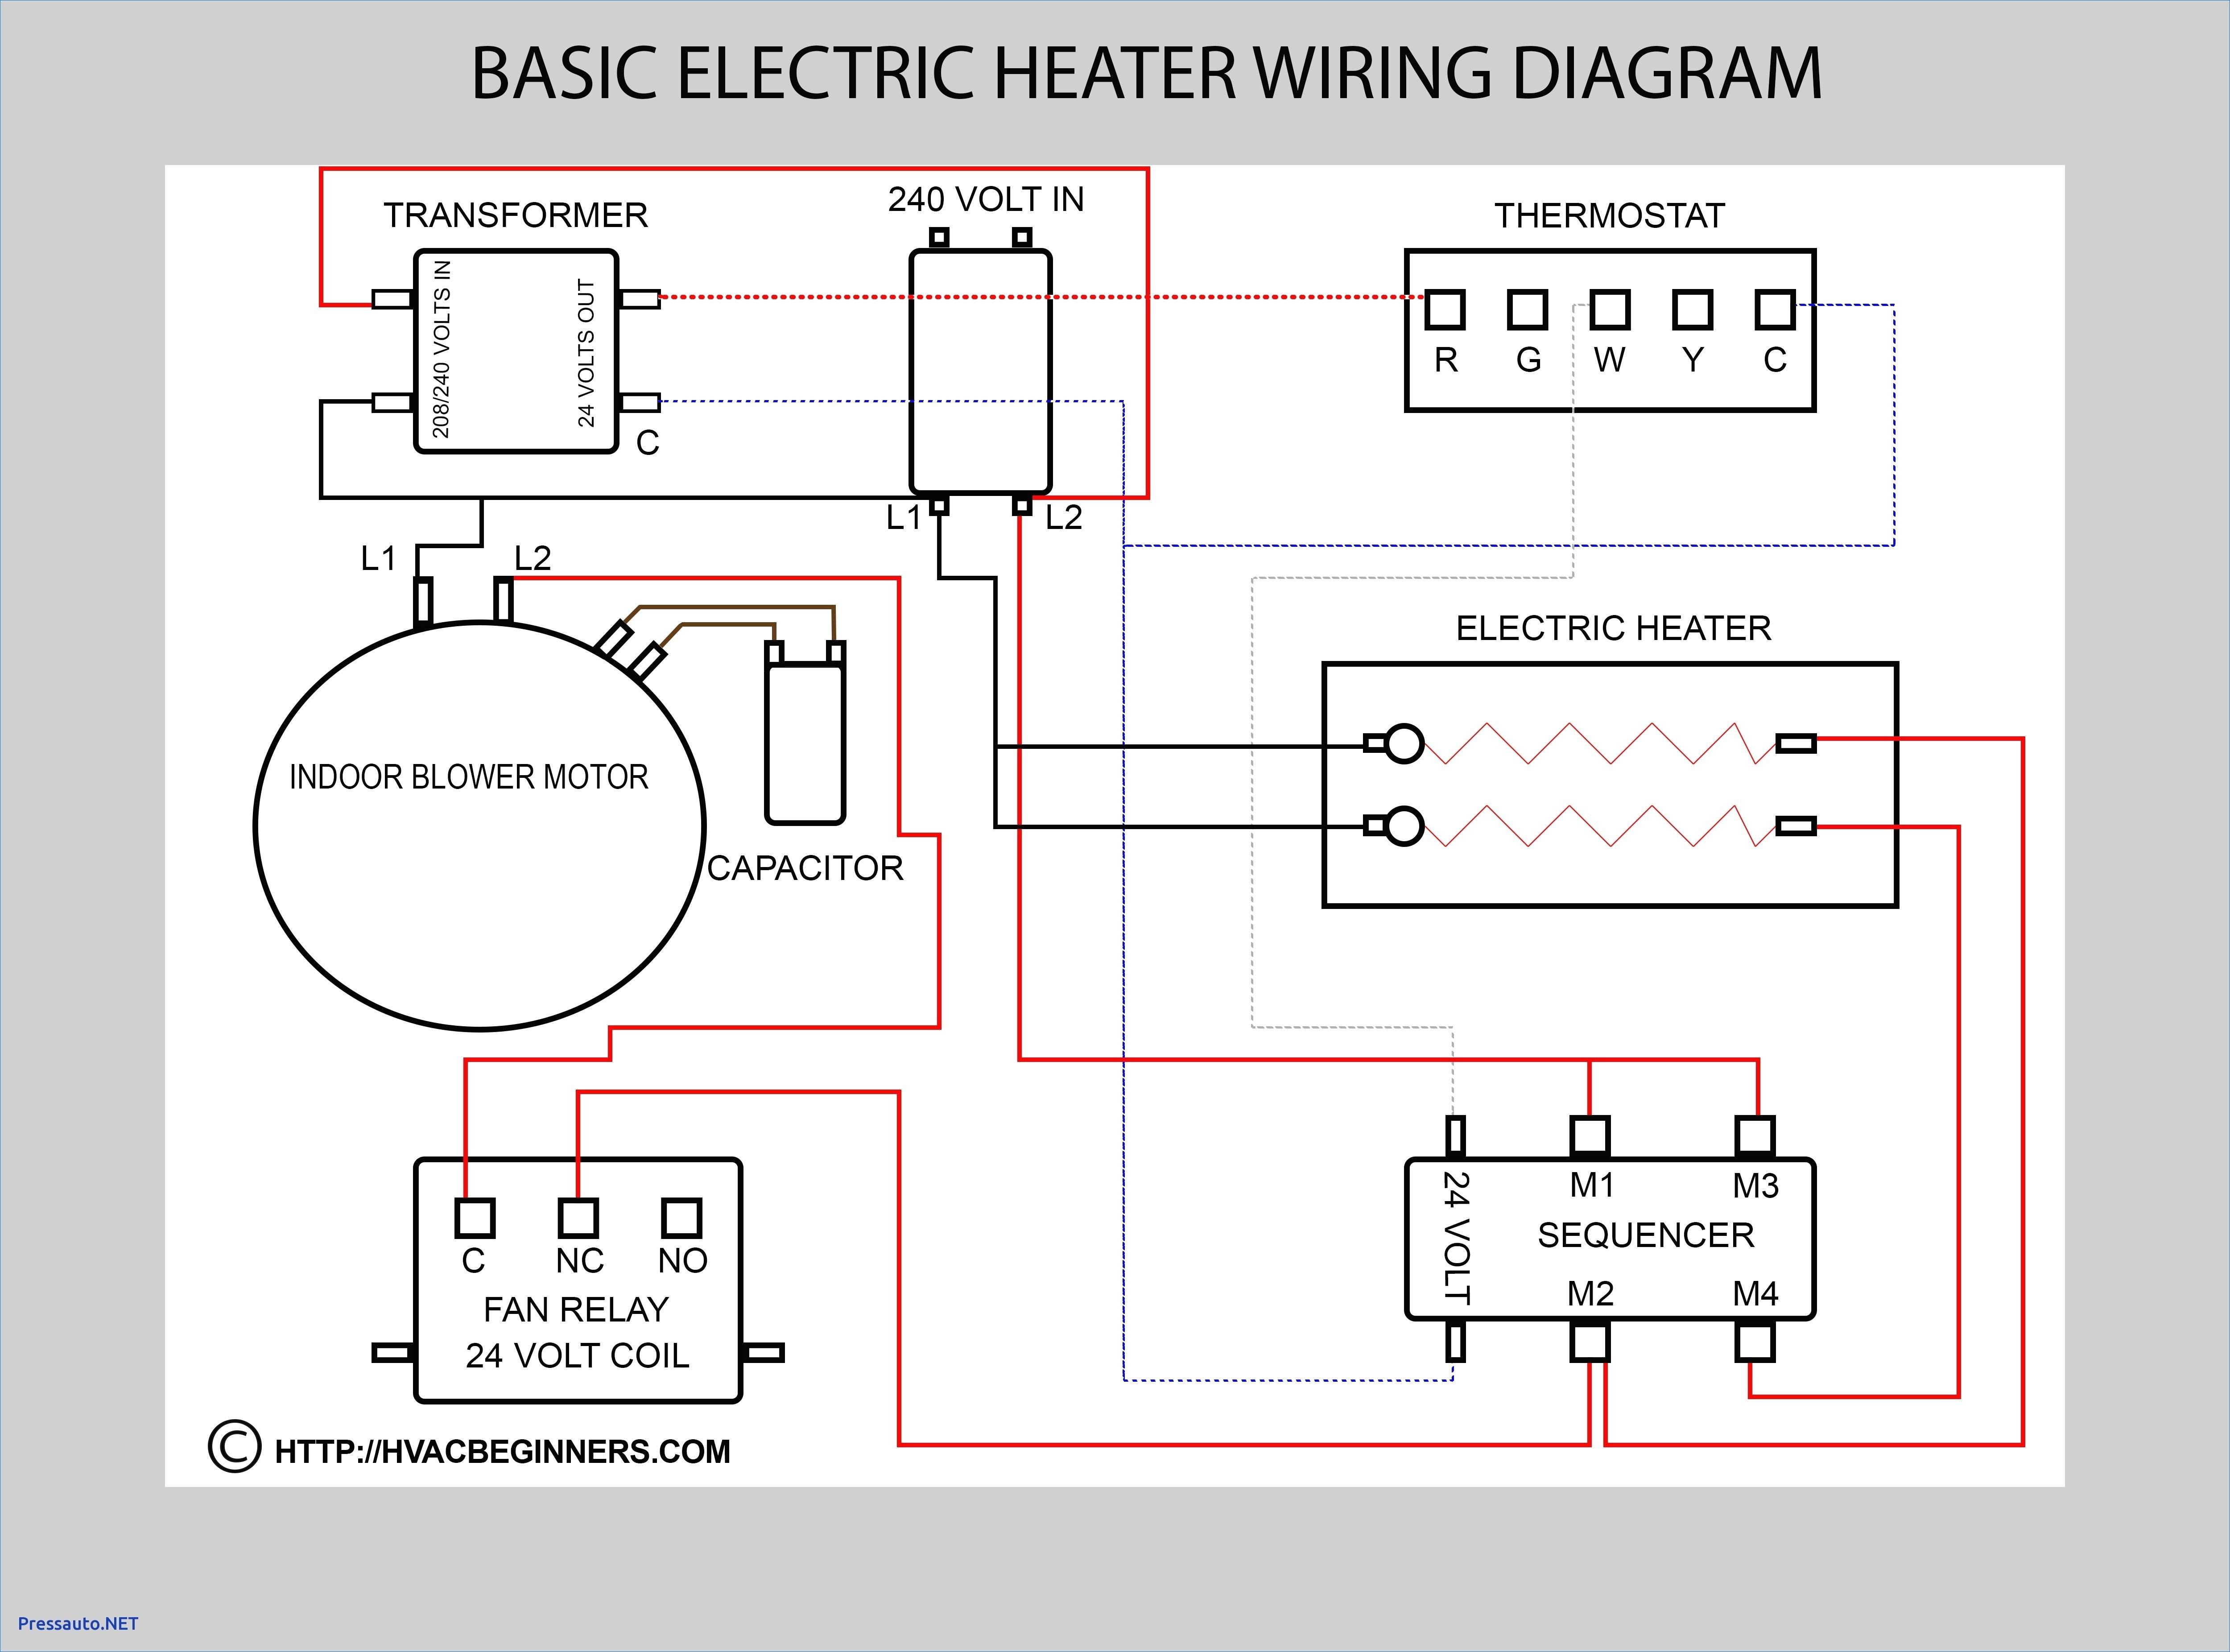 trane xv95 thermostat wiring diagram Download-Trane thermostat Wiring Diagram New Trane Wiring Diagrams Wiring 10-n